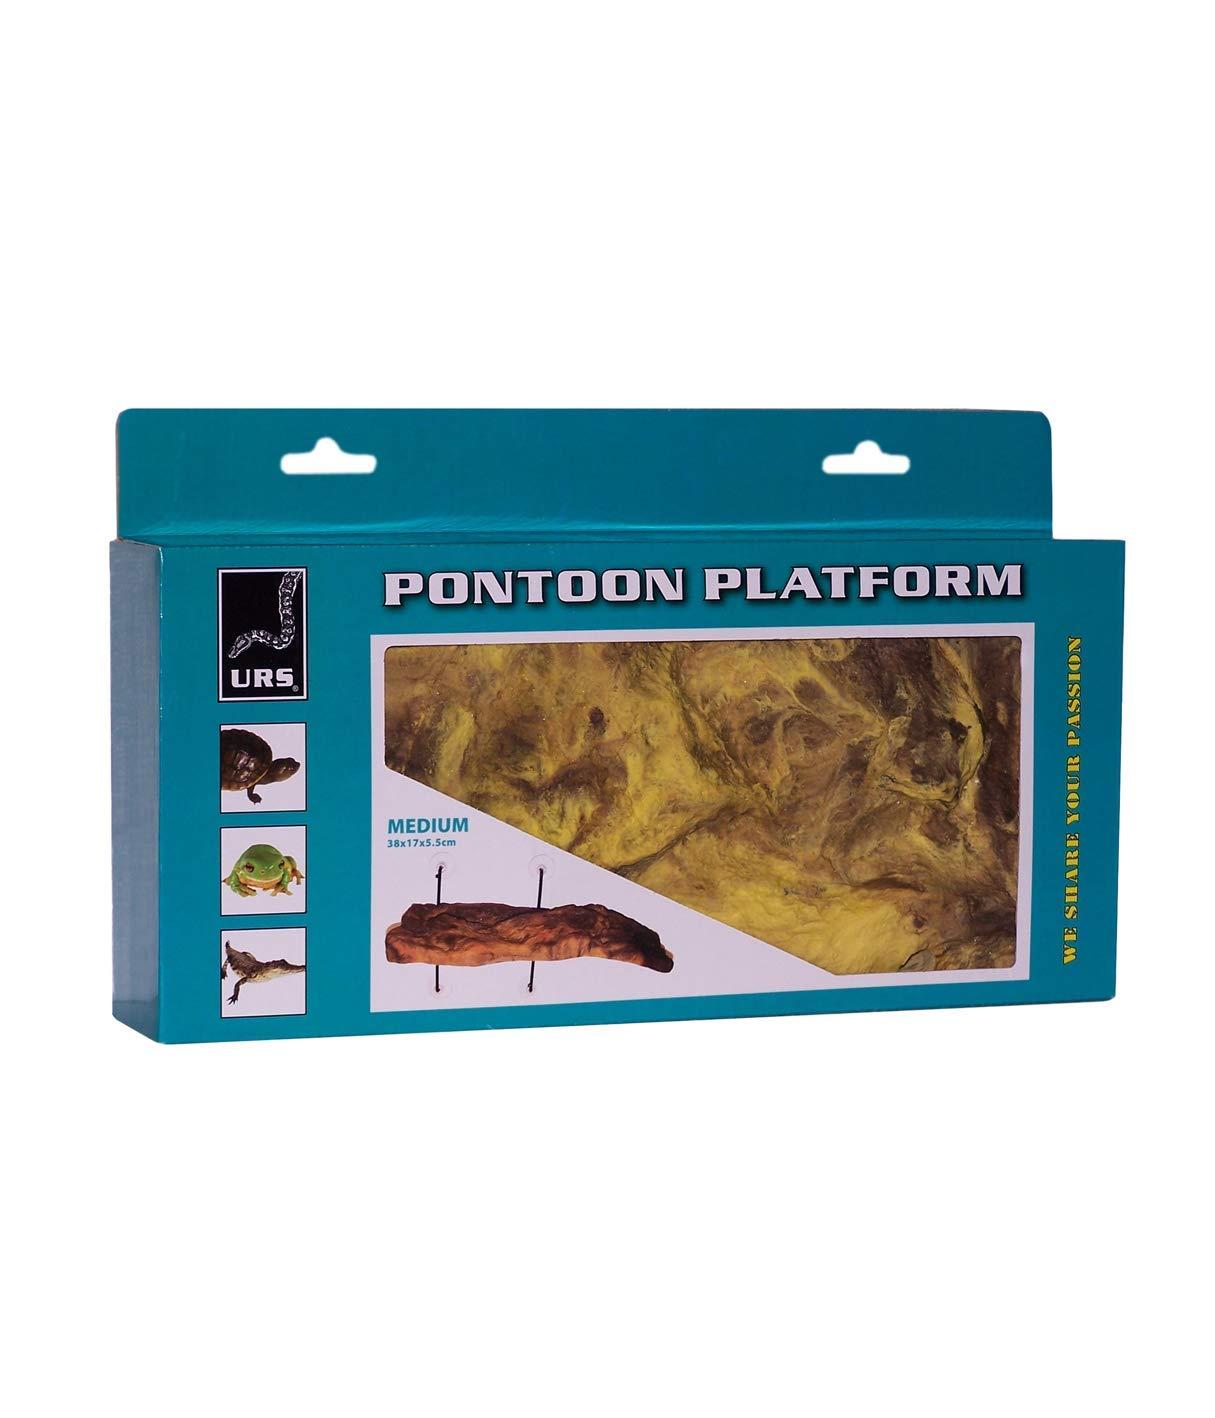 Medium URS Turtle Dock Pontoon Platforms for Turtles Medium